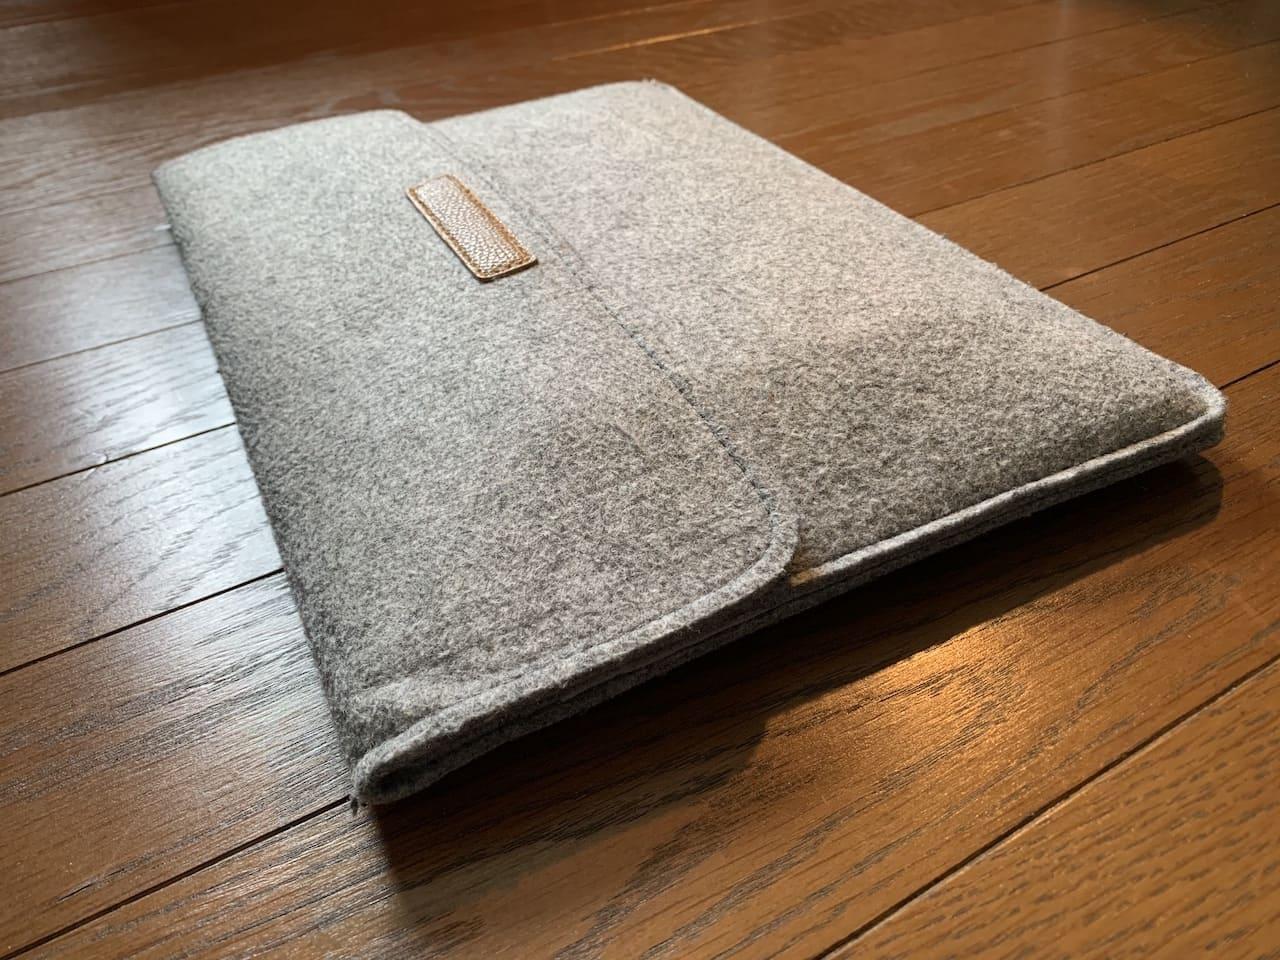 InateckのMacBookAir/Pro用ケースの外観